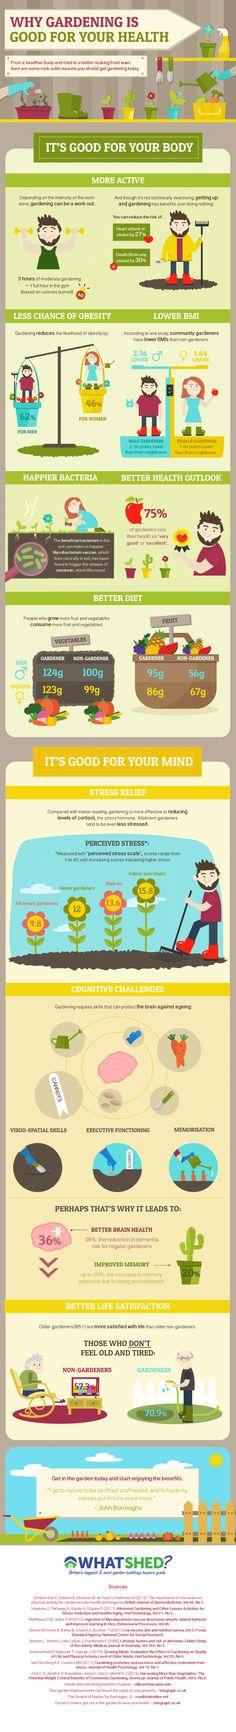 Health Benefits Of Gardening - Infographic Benefits Of Gardening, Gardening Tips, Organic Gardening, Urban Gardening, Vegetable Gardening, Get Healthy, Healthy Life, Health And Beauty, Health And Wellness